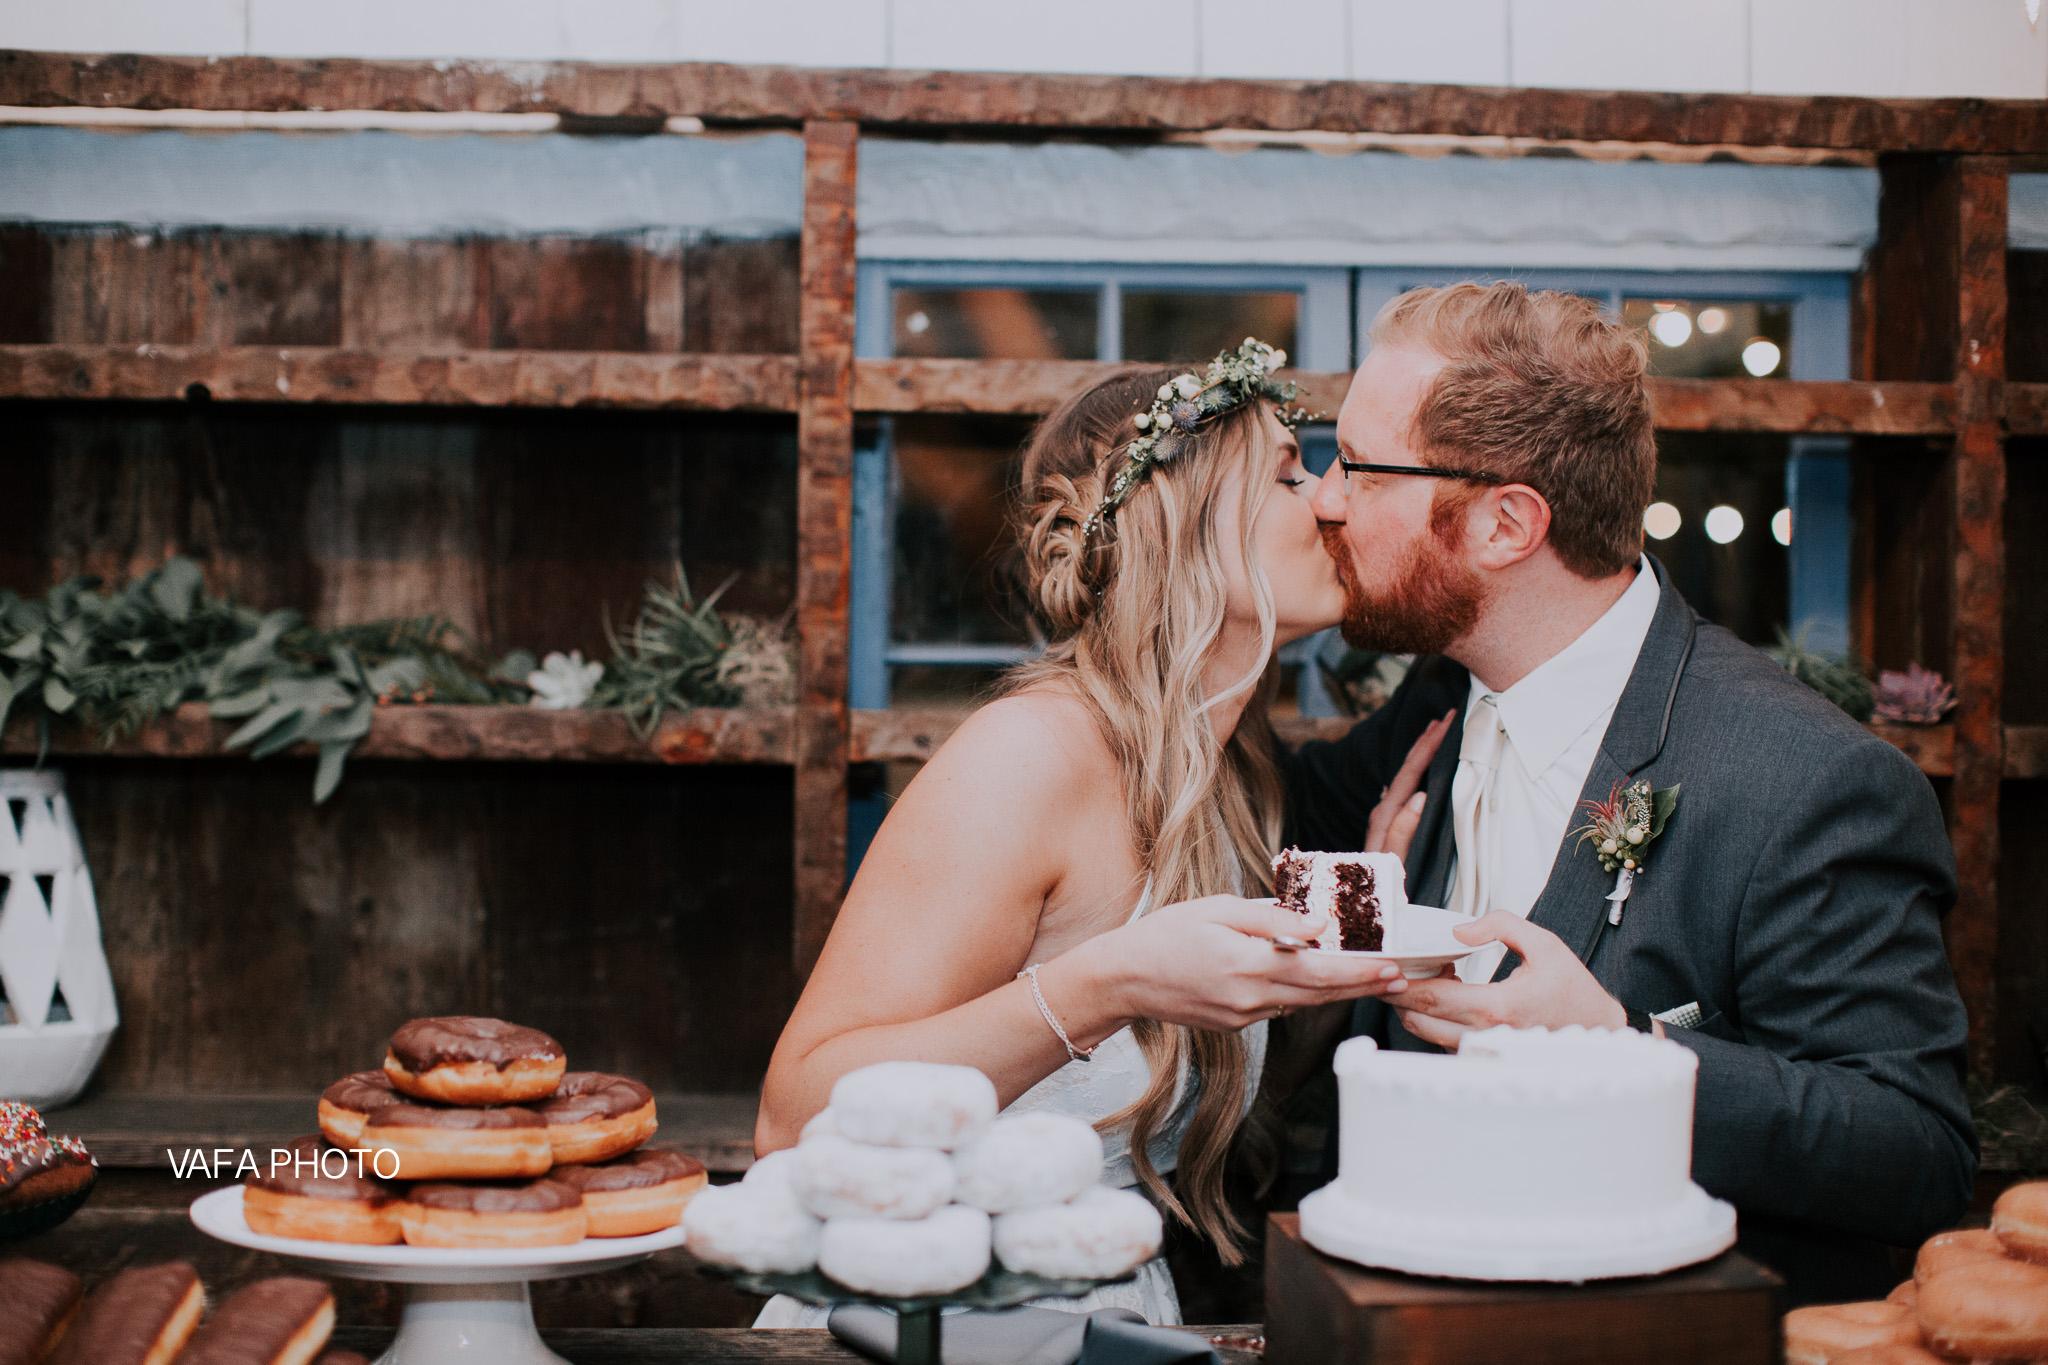 Leo-Carrillo-Ranch-Wedding-Lauren-Mike-Vafa-Photo-1149.jpg